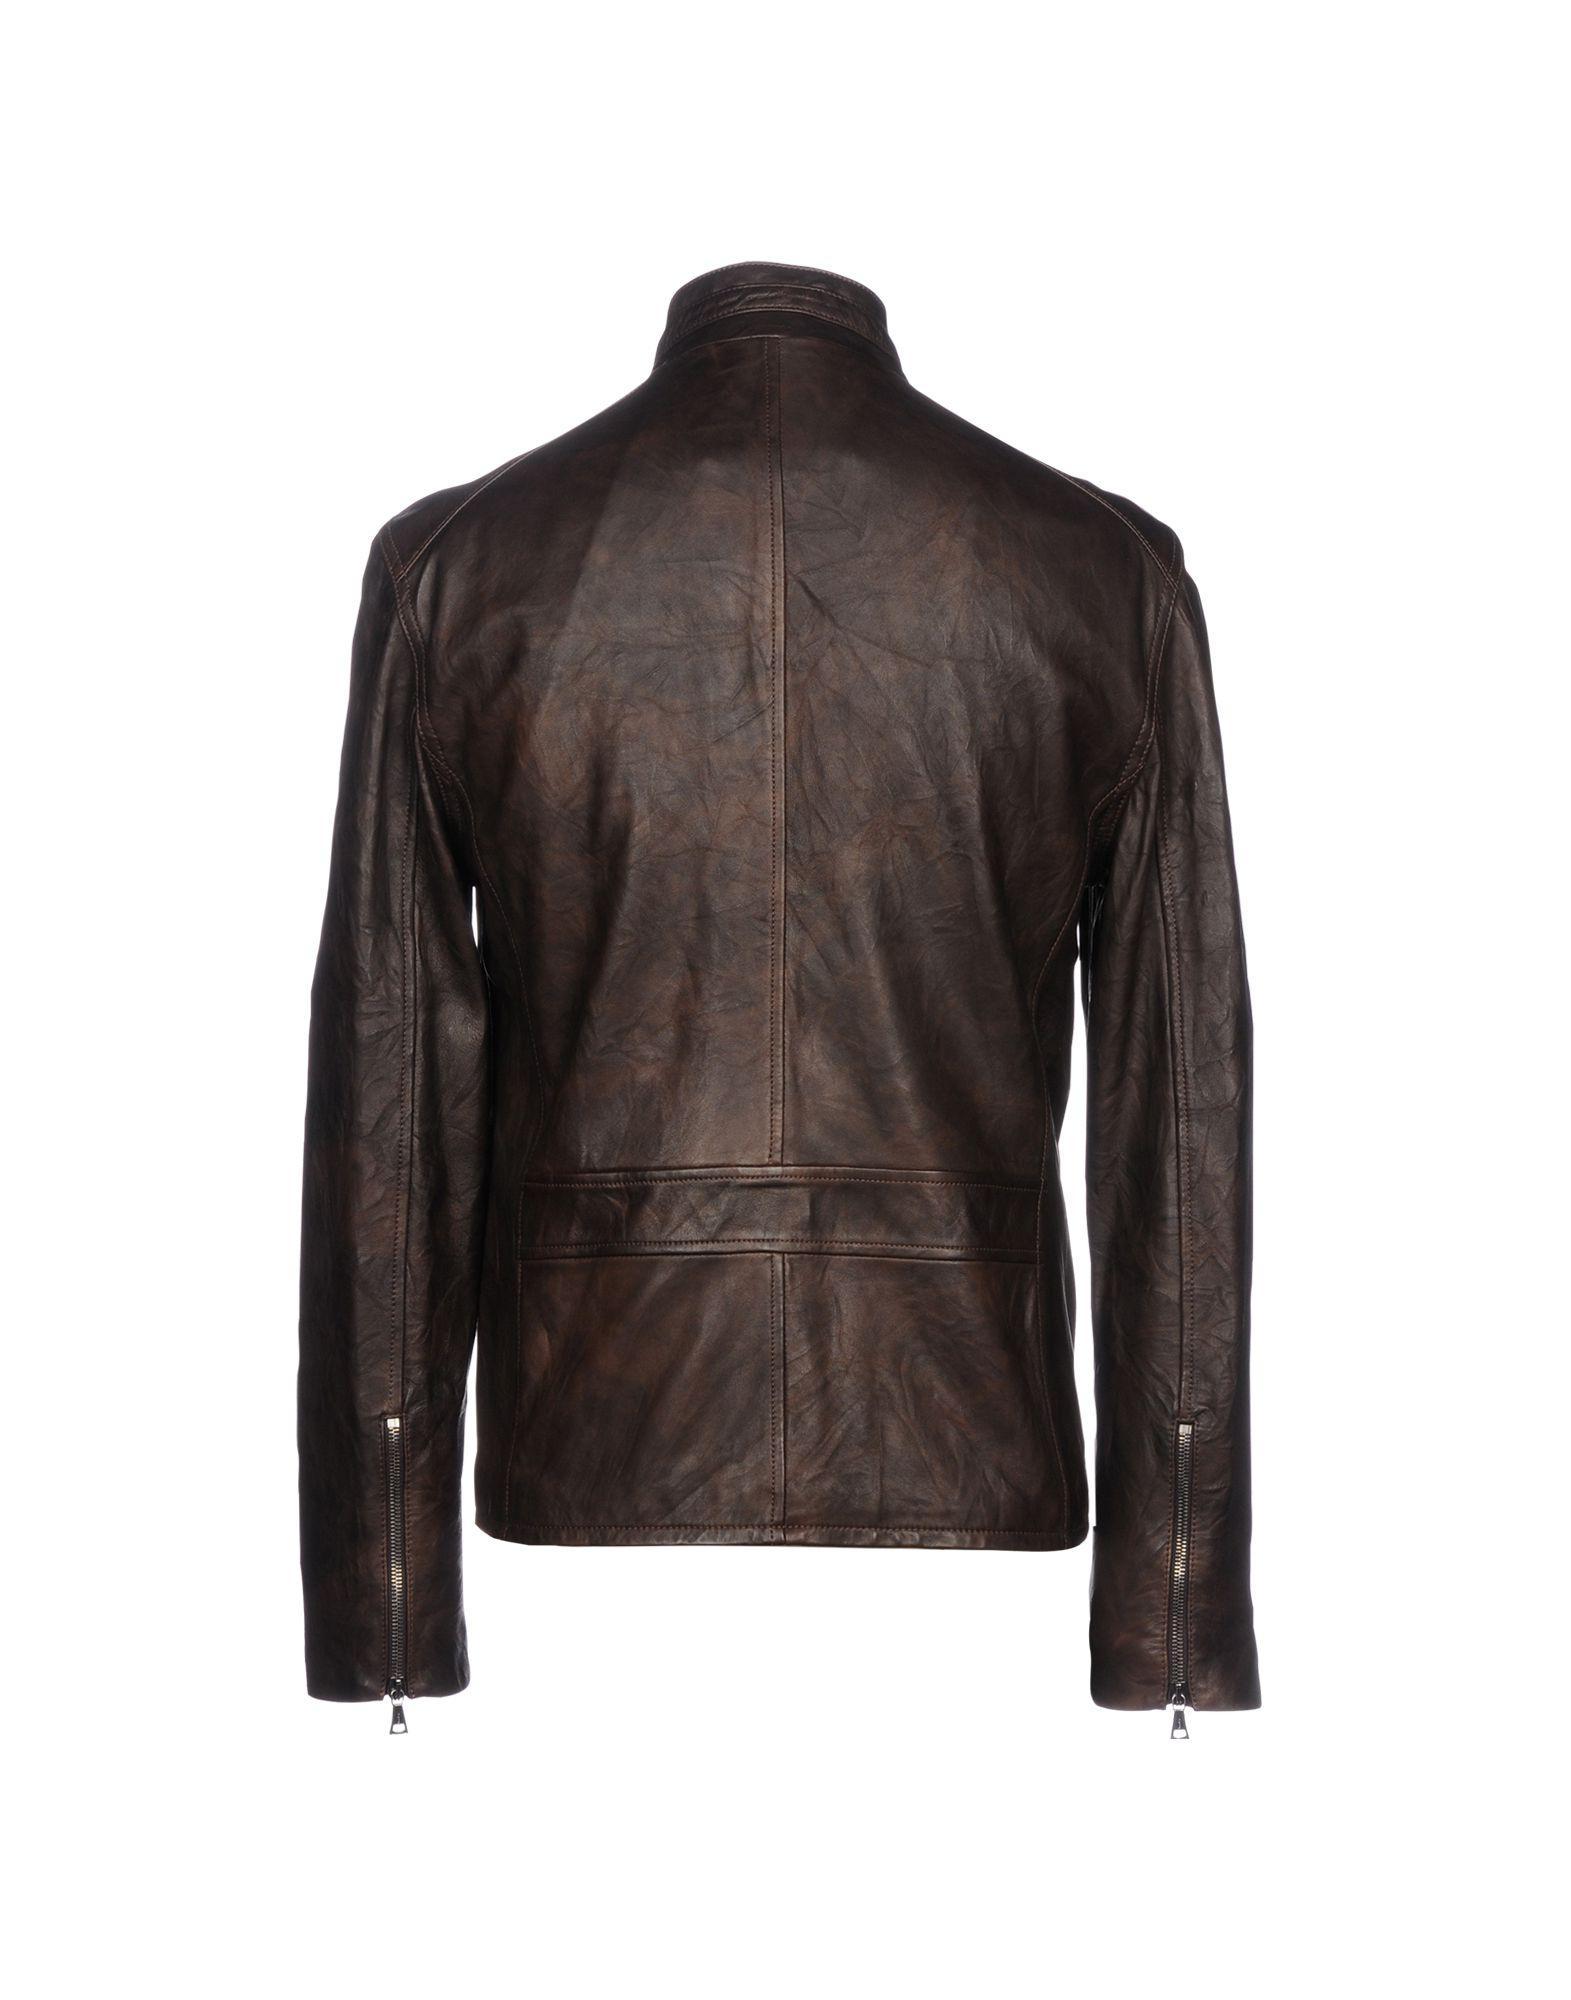 John Varvatos Jackets In Dark Brown